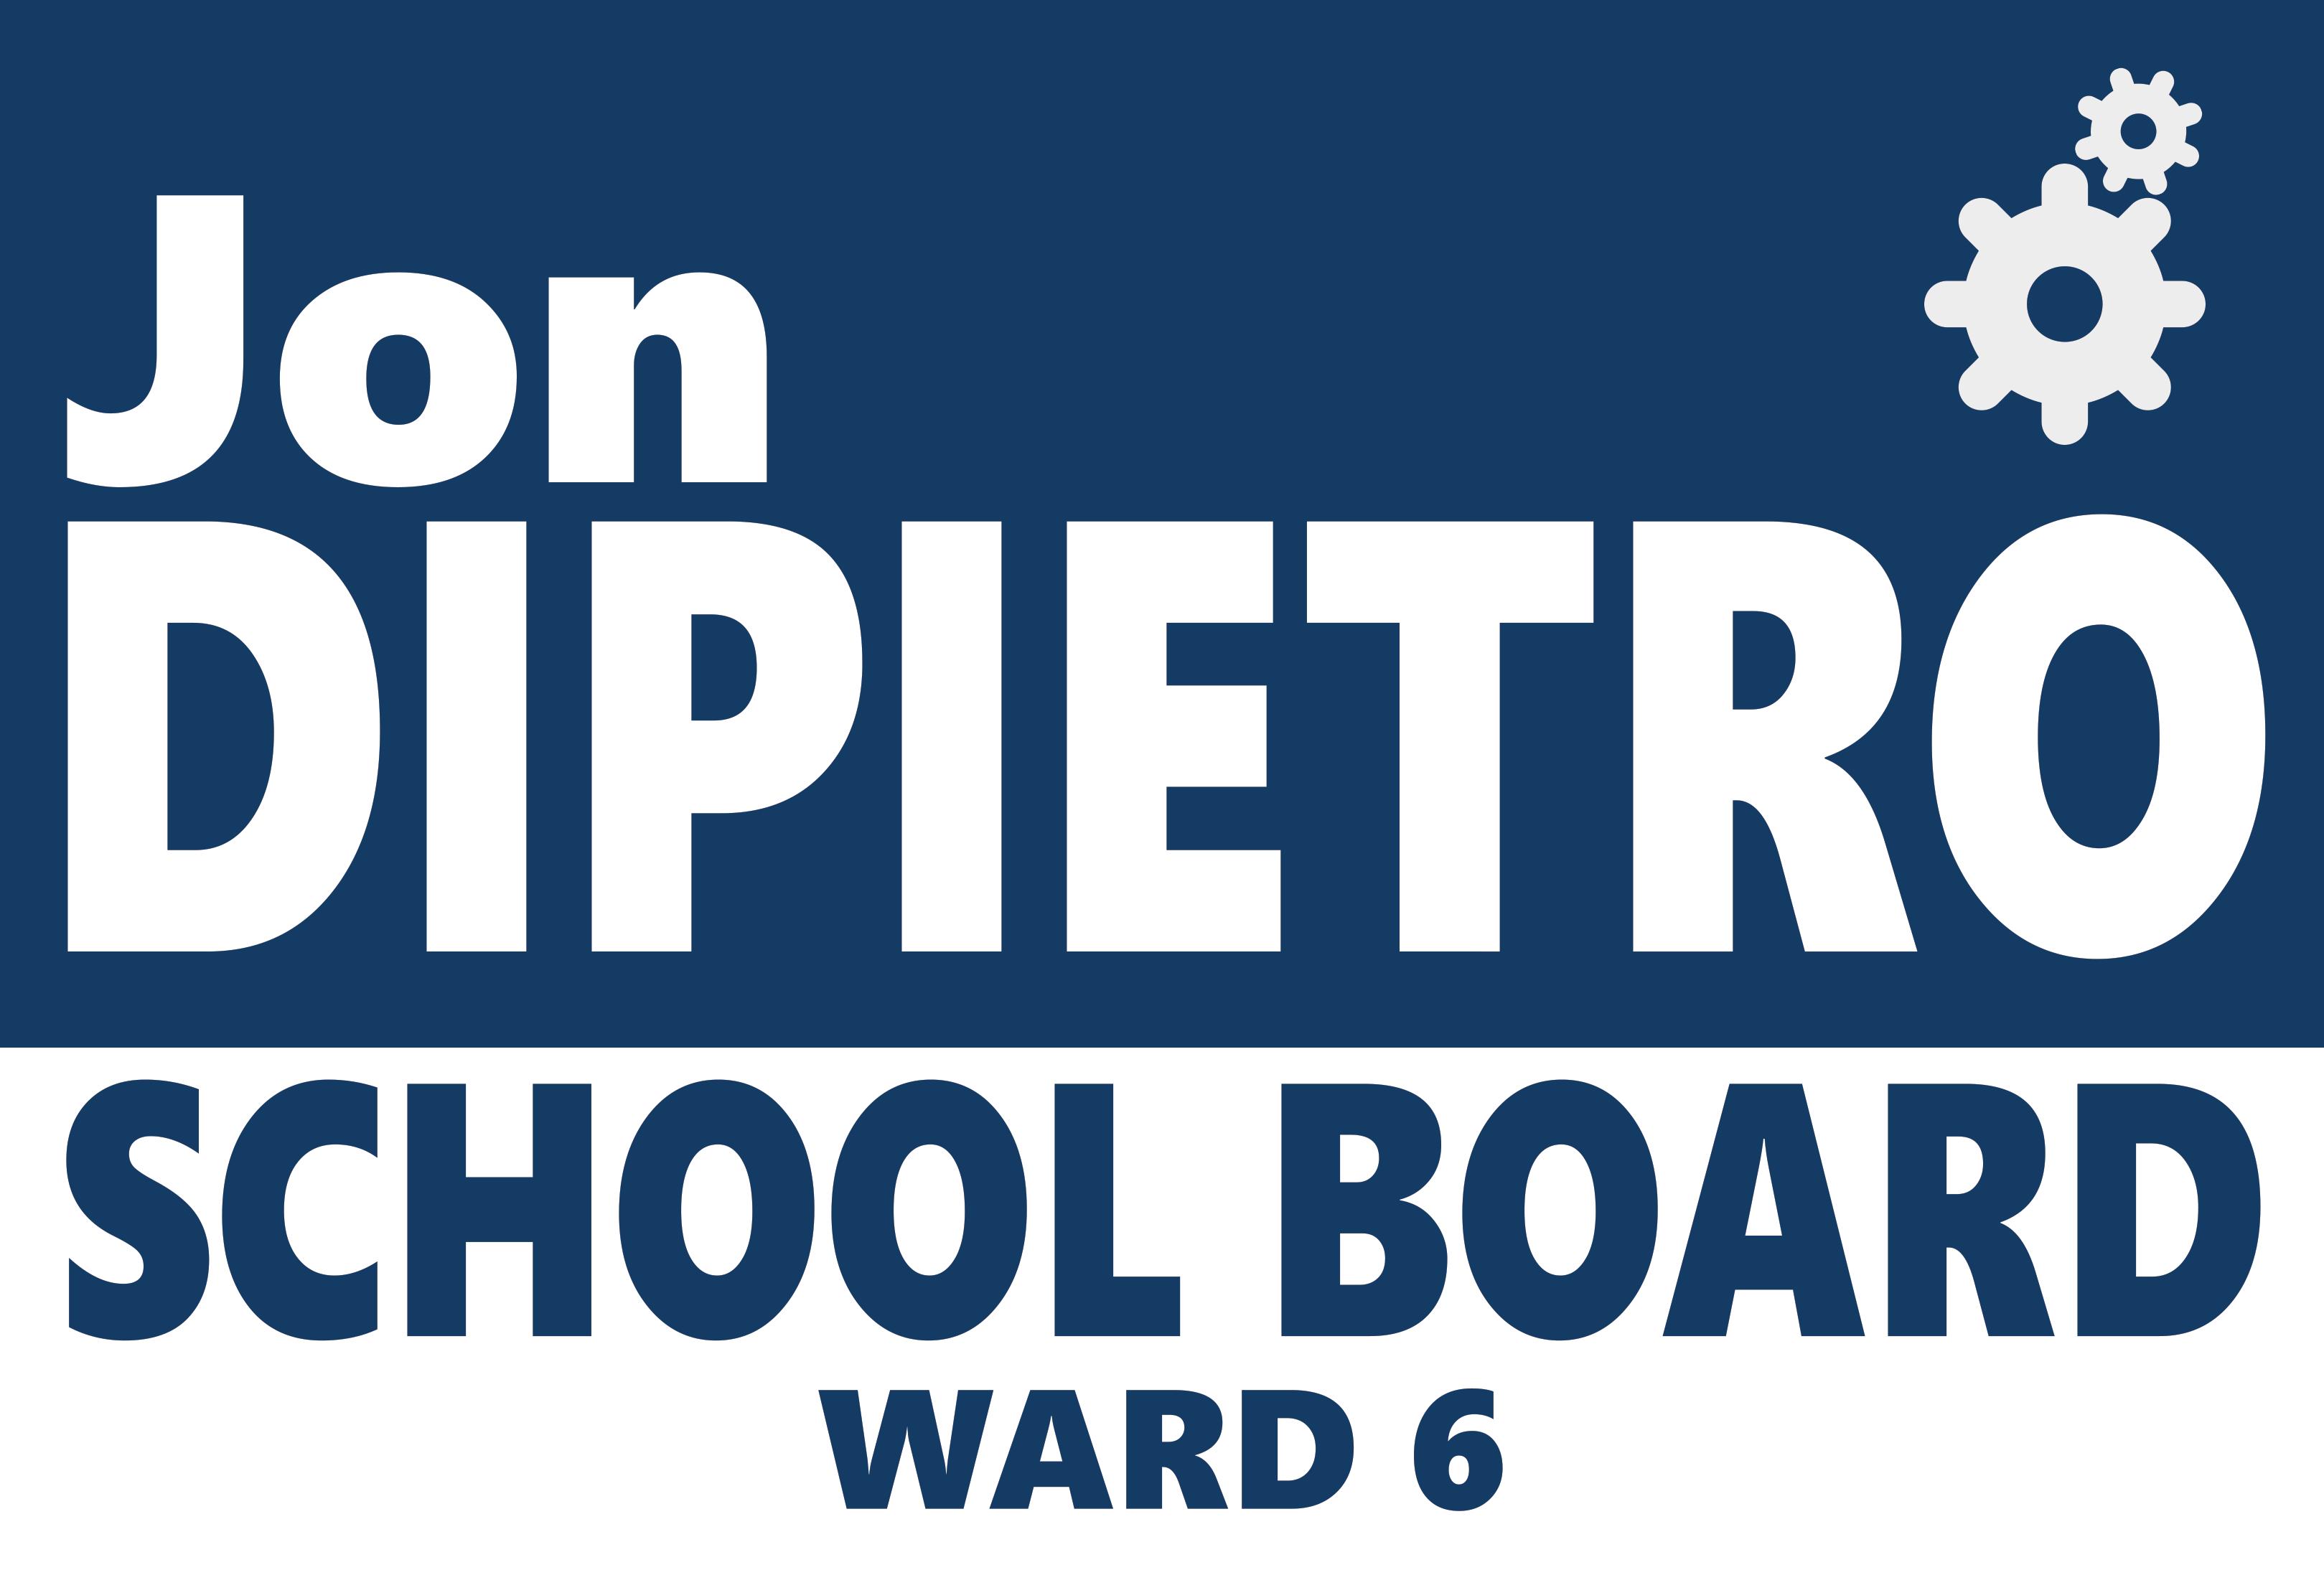 jon dipietro for school board ward 6